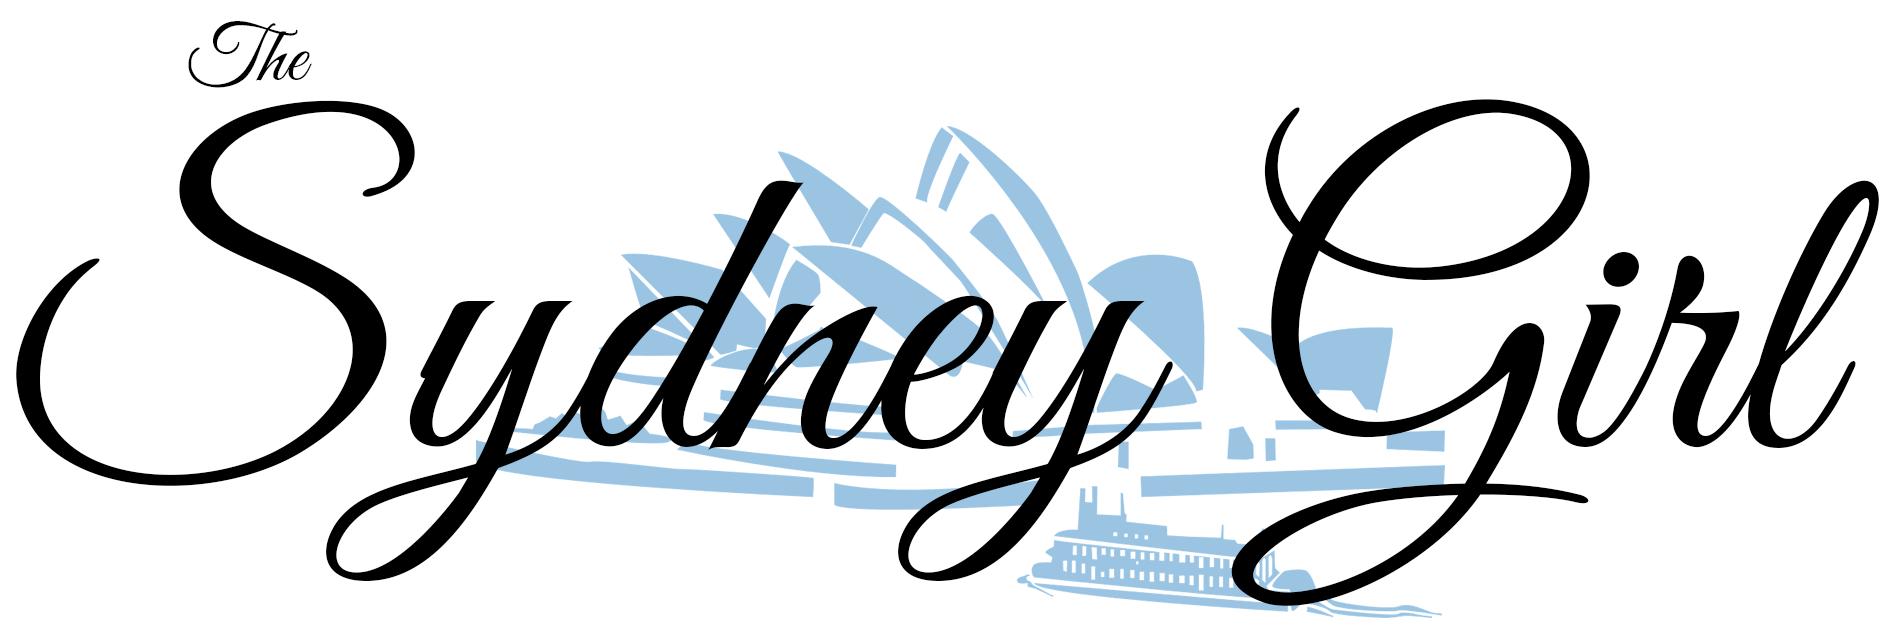 The Sydney Girl